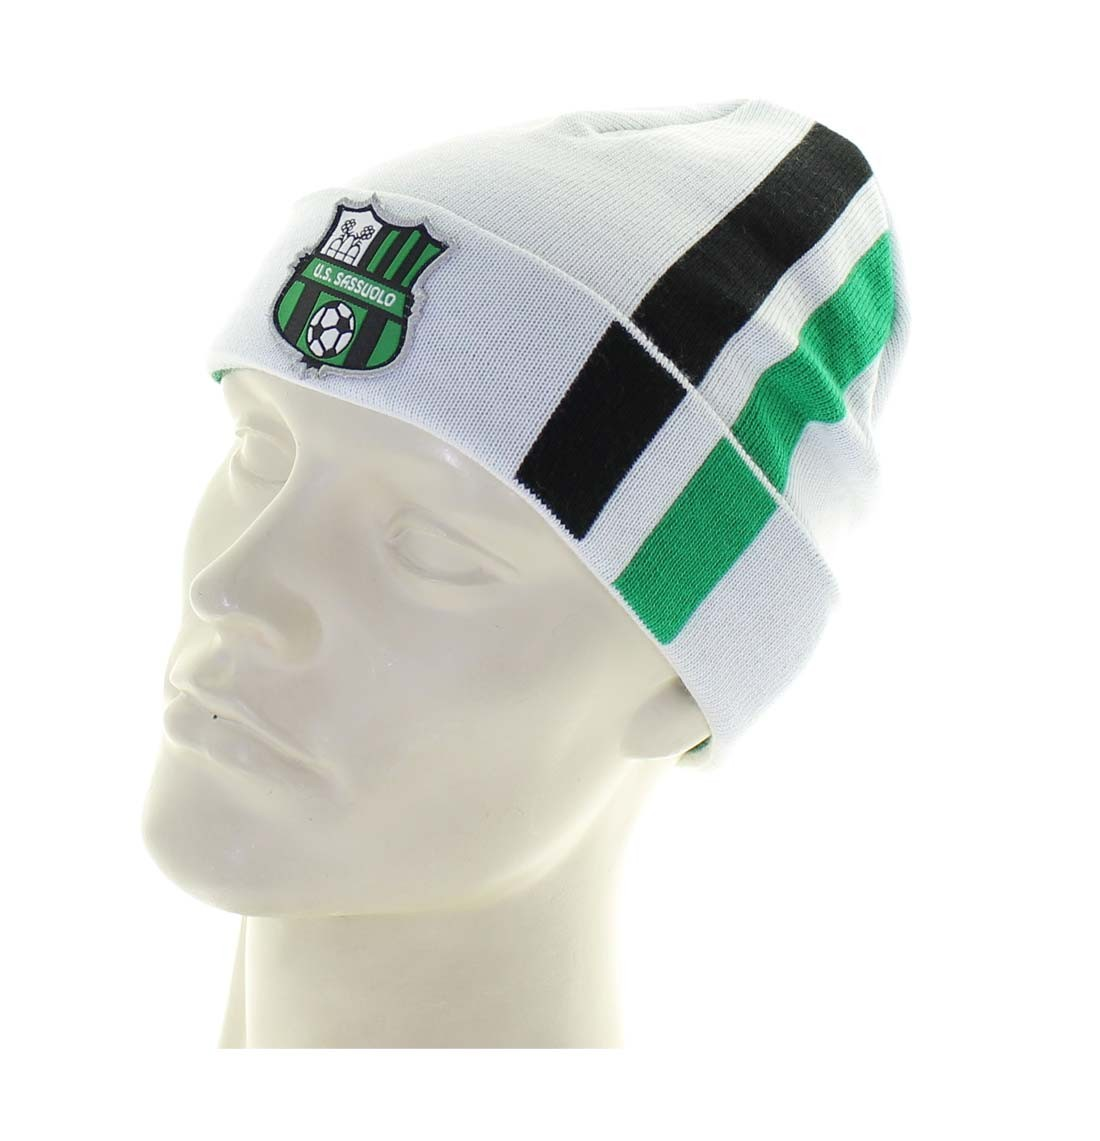 official jersey Sassuolo Kappa f33e1a23cc6f0